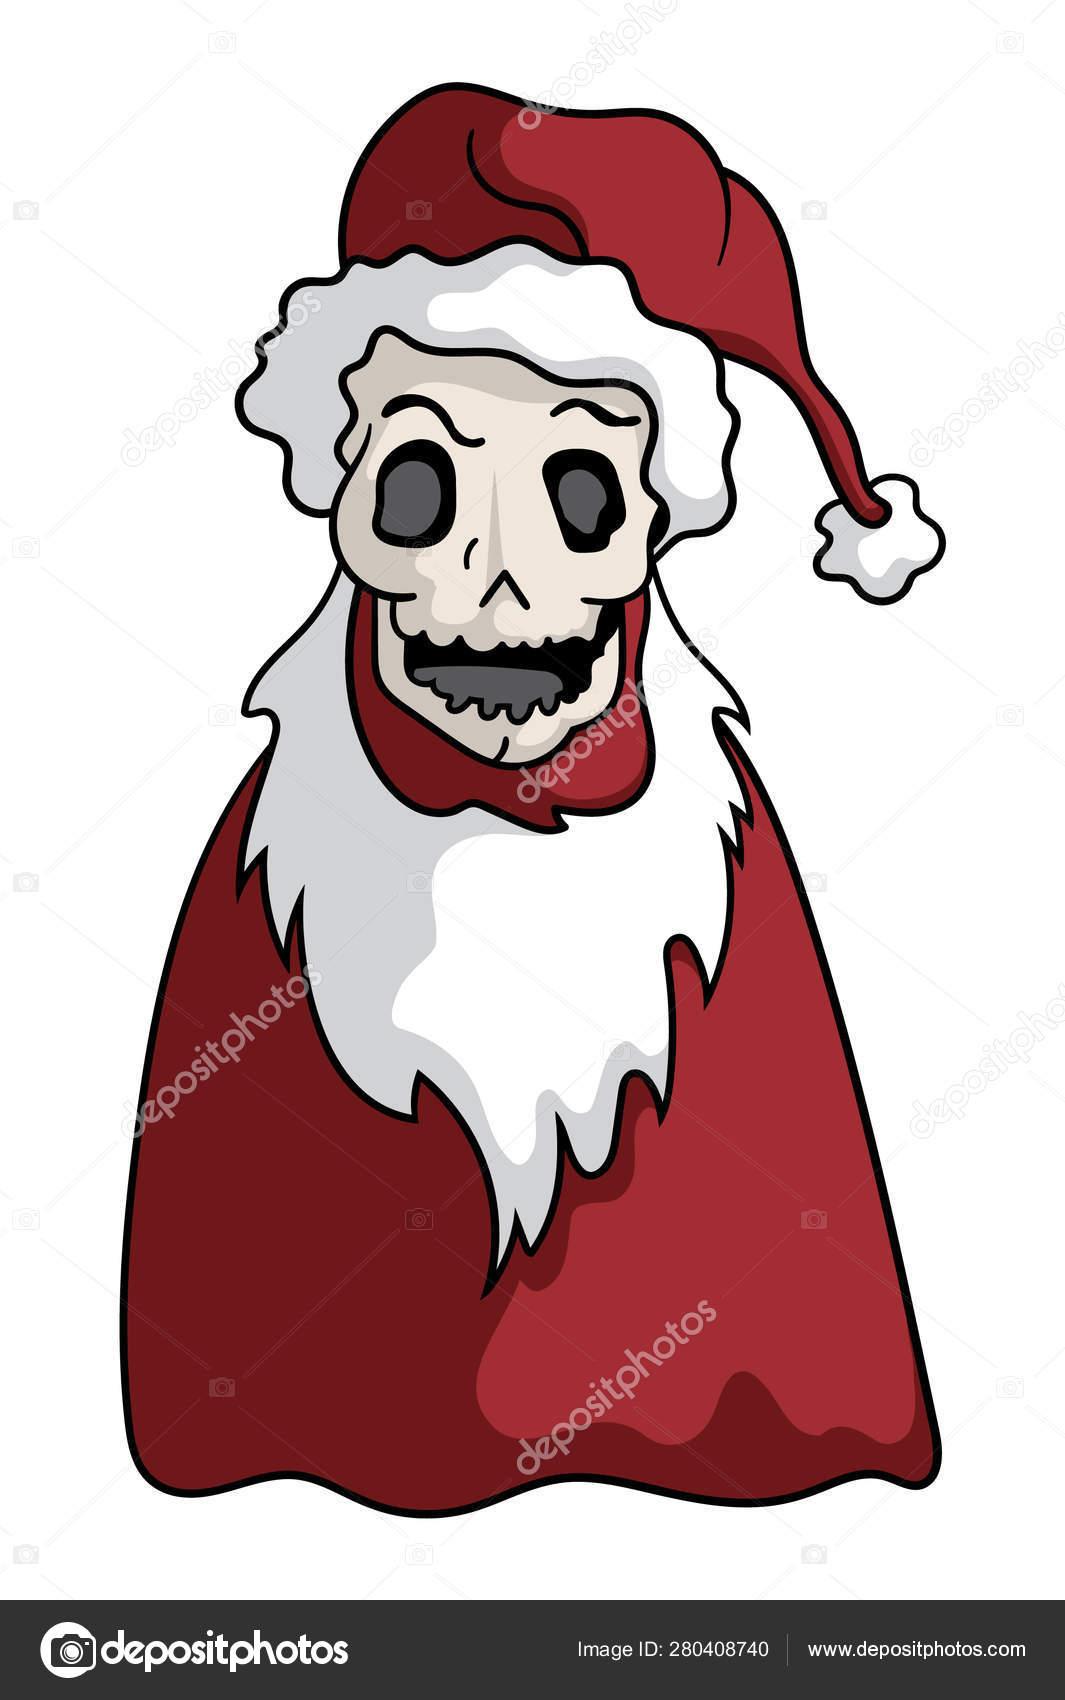 Christmas Skeleton.Cartoon Style Illustration Skeleton Santa Claus Halloween